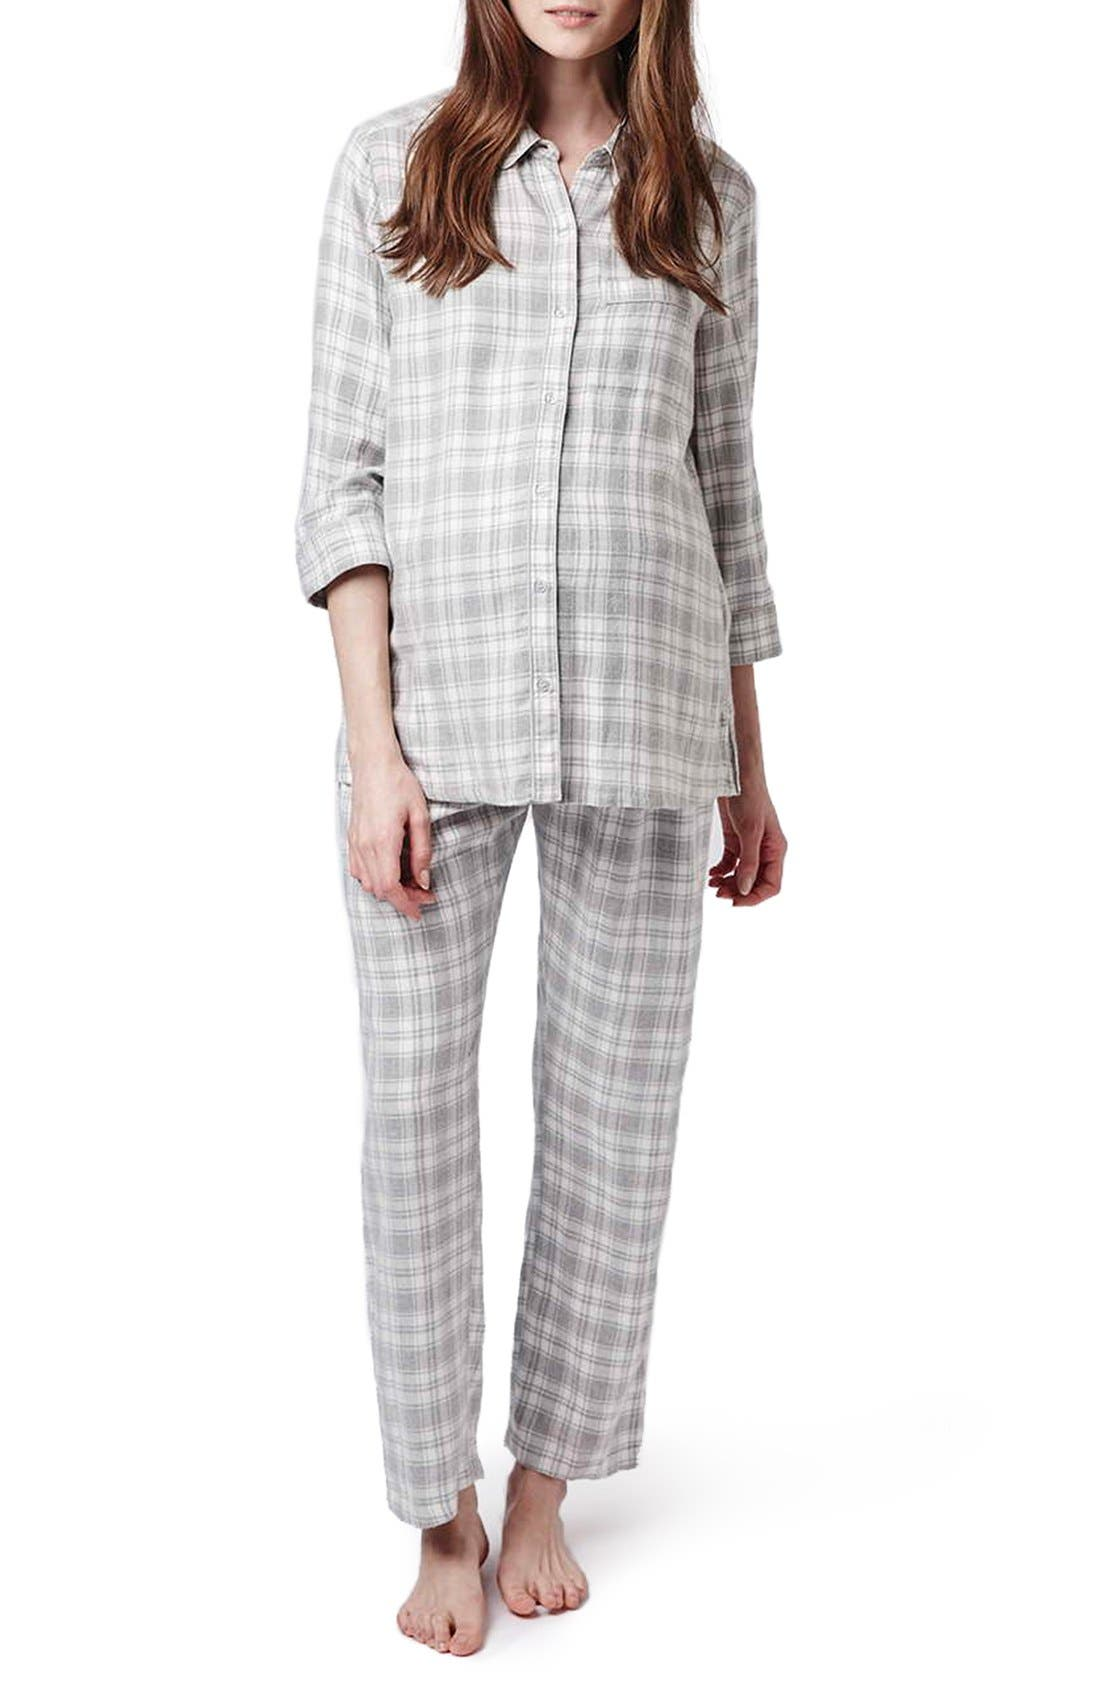 Alternate Image 1 Selected - Topshop Plaid Maternity Pajamas